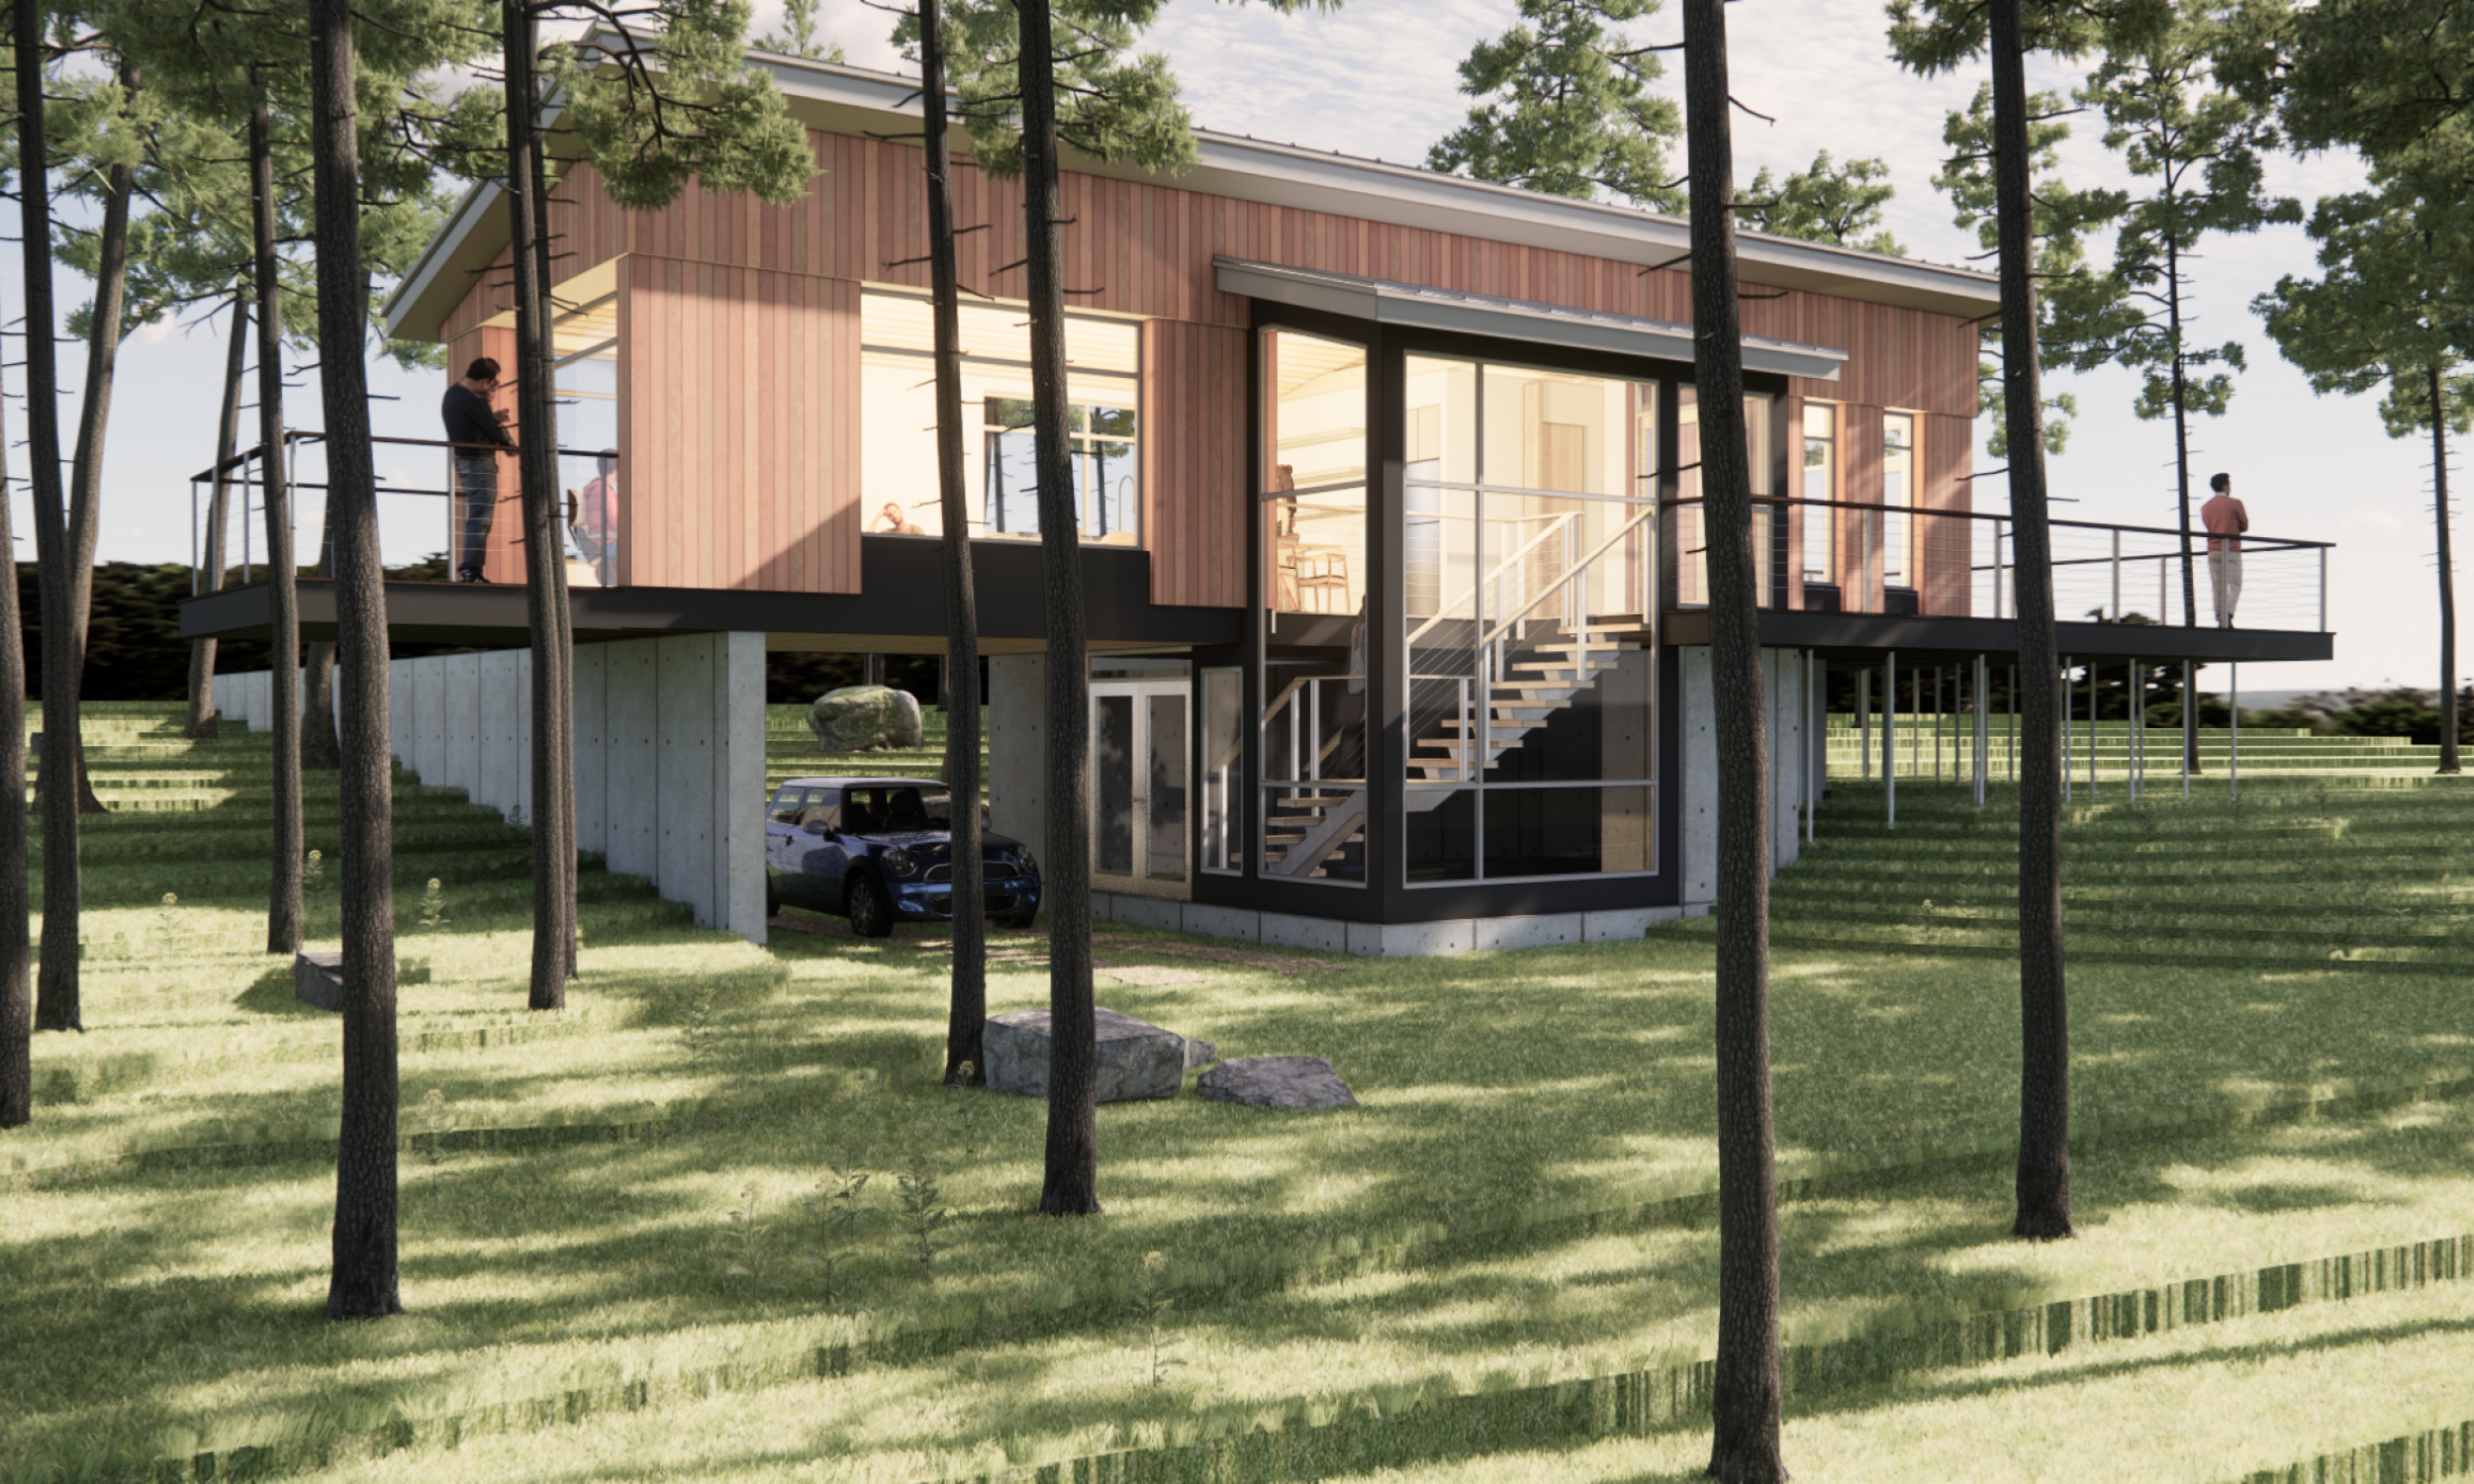 prefabricated design, raised above the ground, Maine architecture